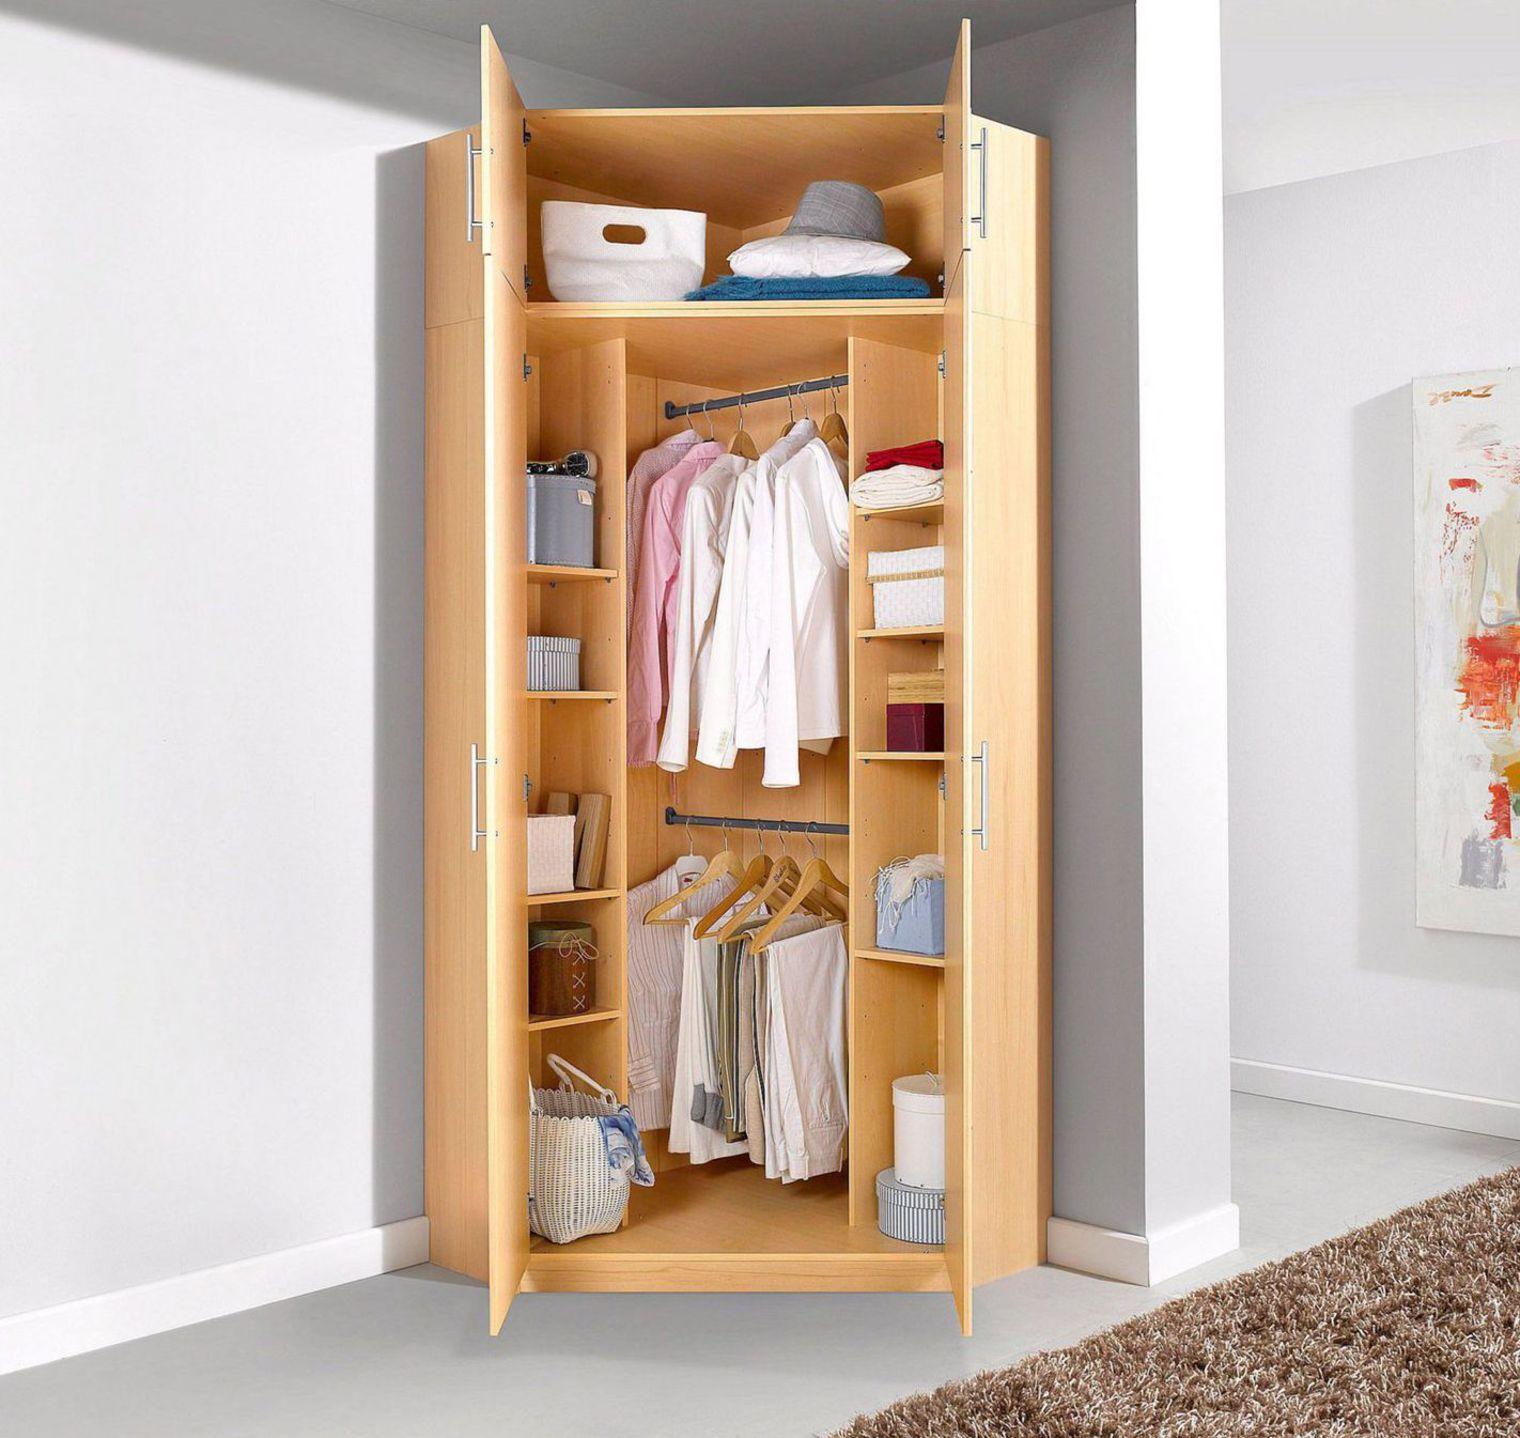 Мебель для комнаты: угловой шкаф